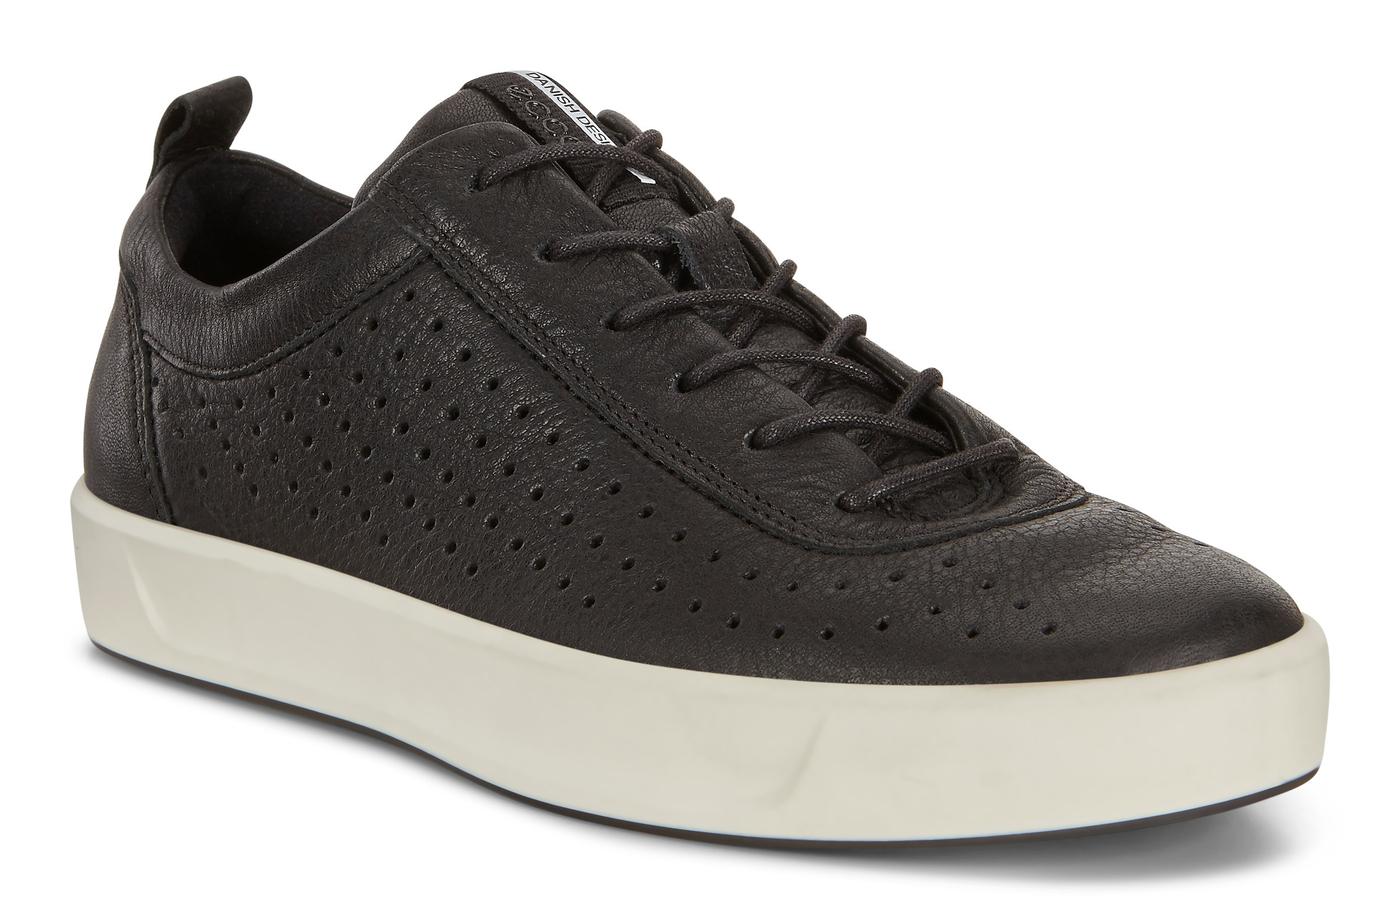 ECCO SOFT 8 LADIES Shoe